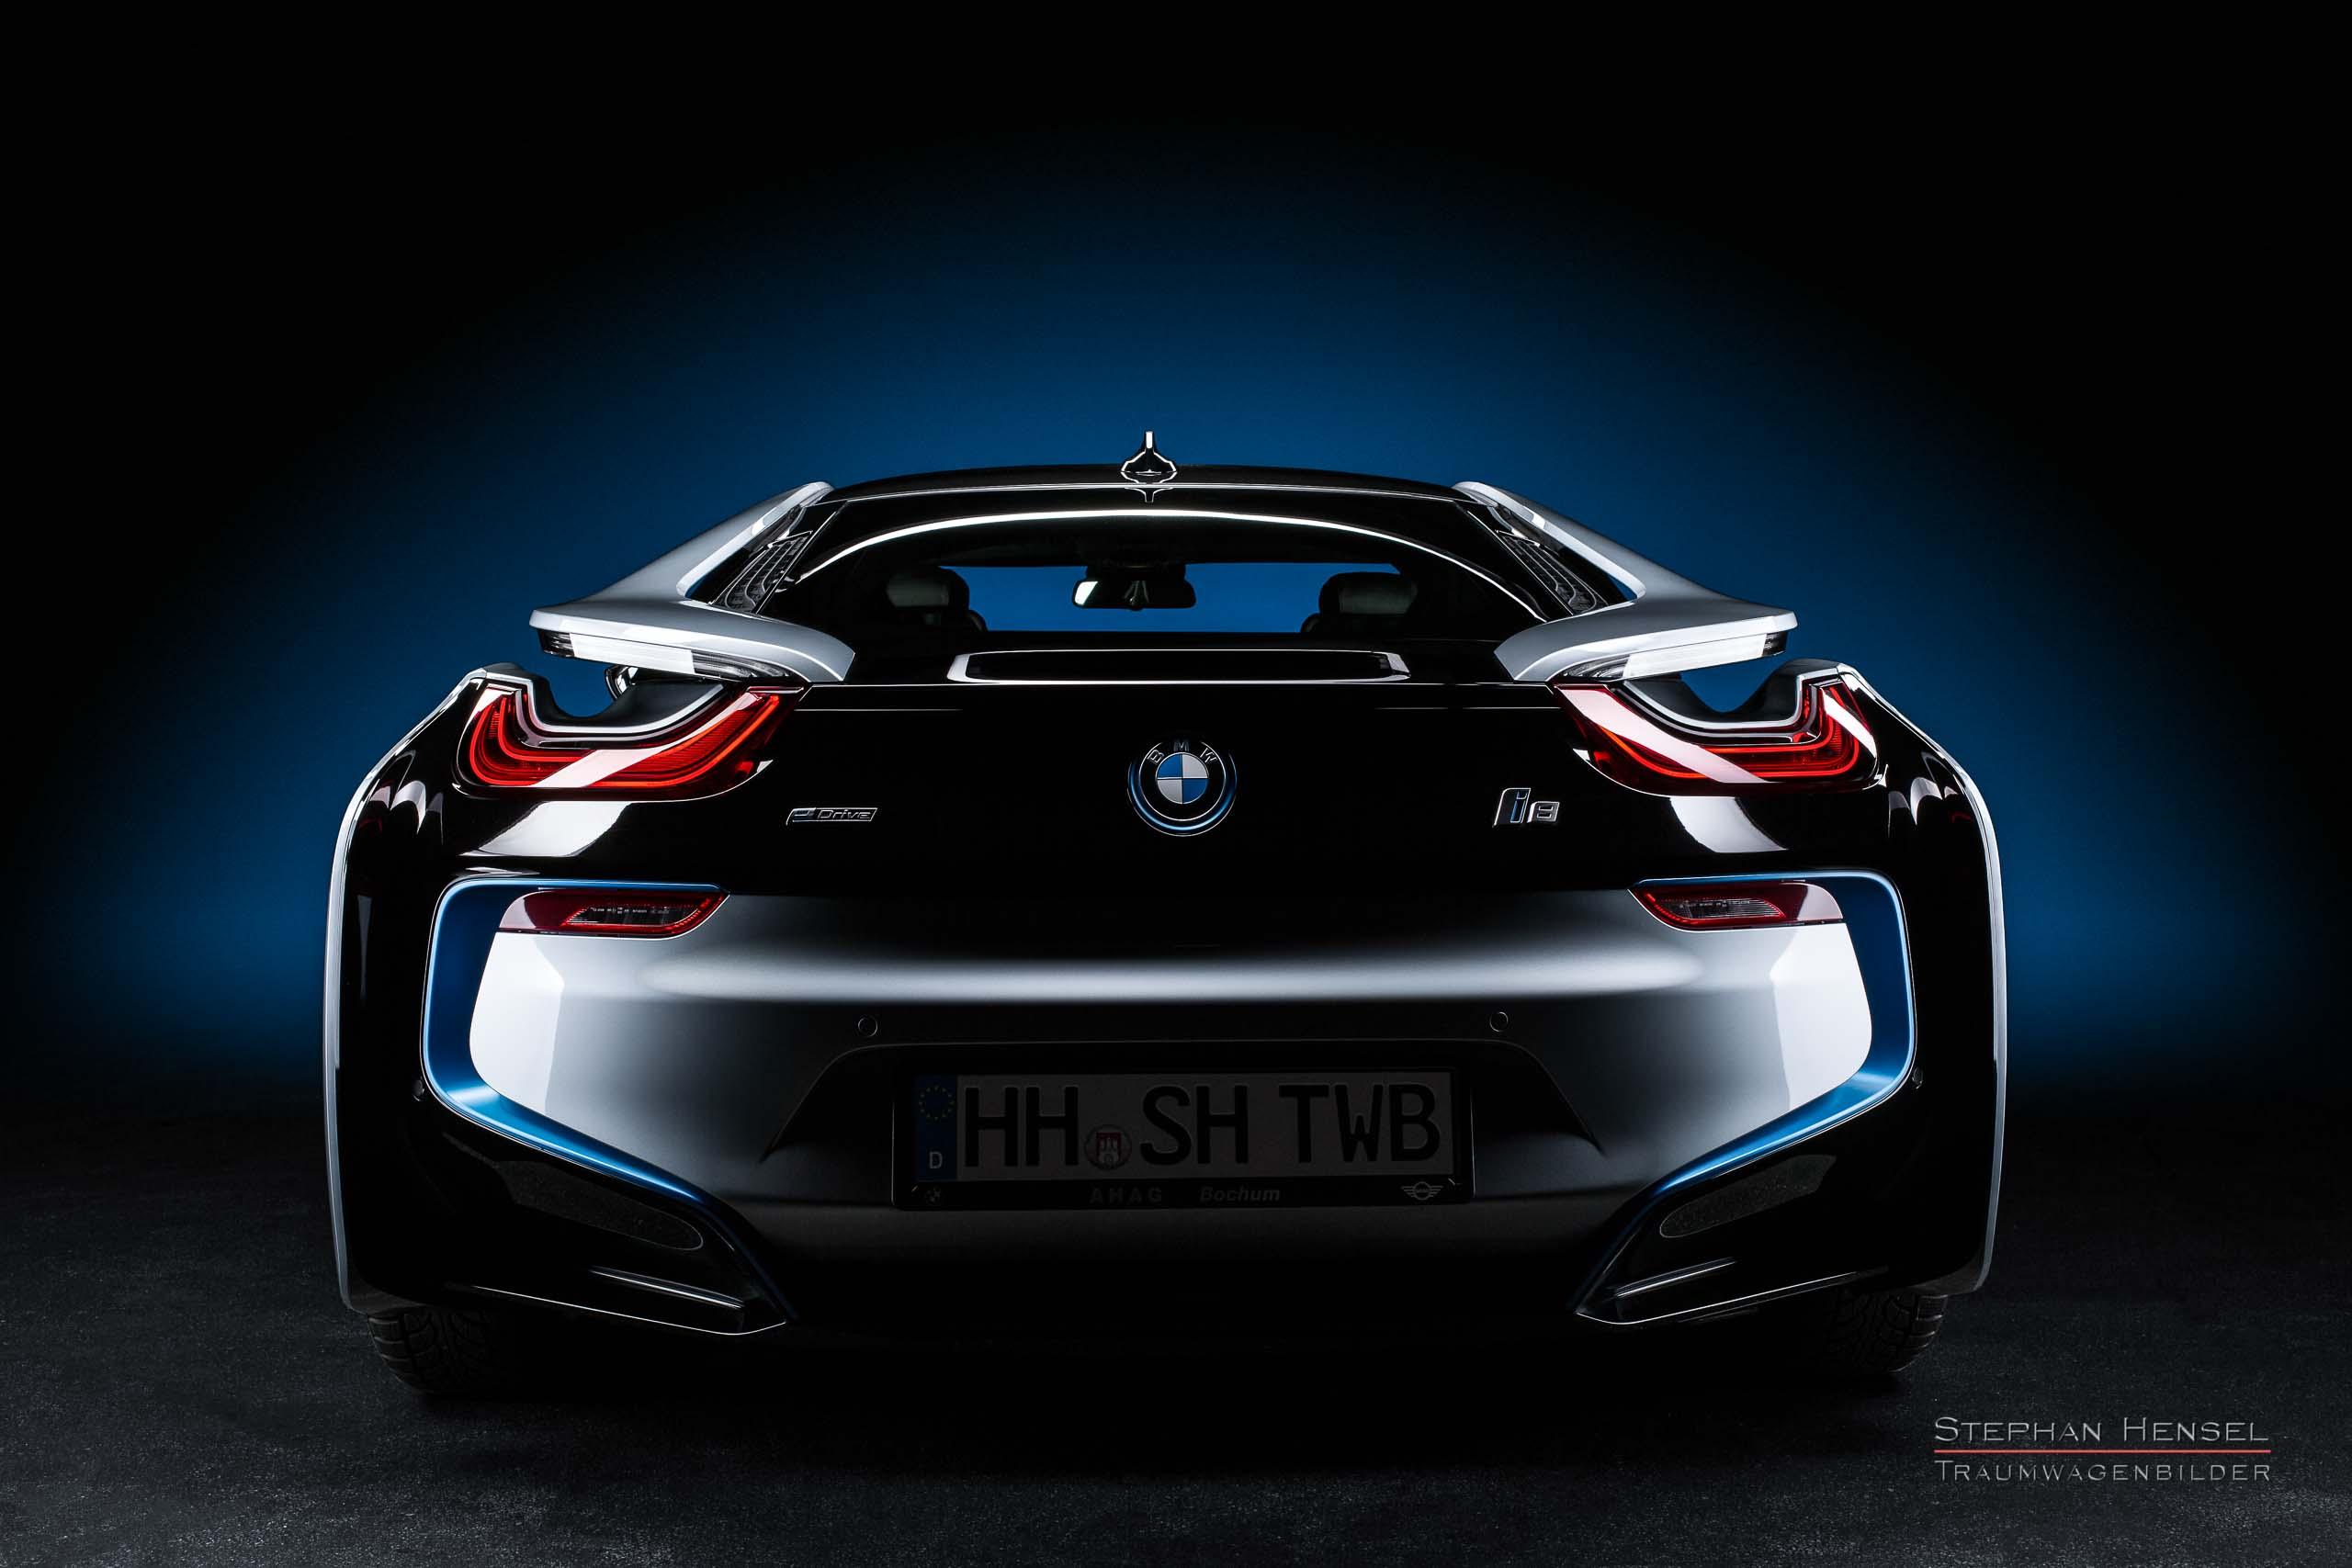 BMW i8, Heckansicht, Autofotograf: Stephan Hensel, Oldtimerfotograf, Hamburg